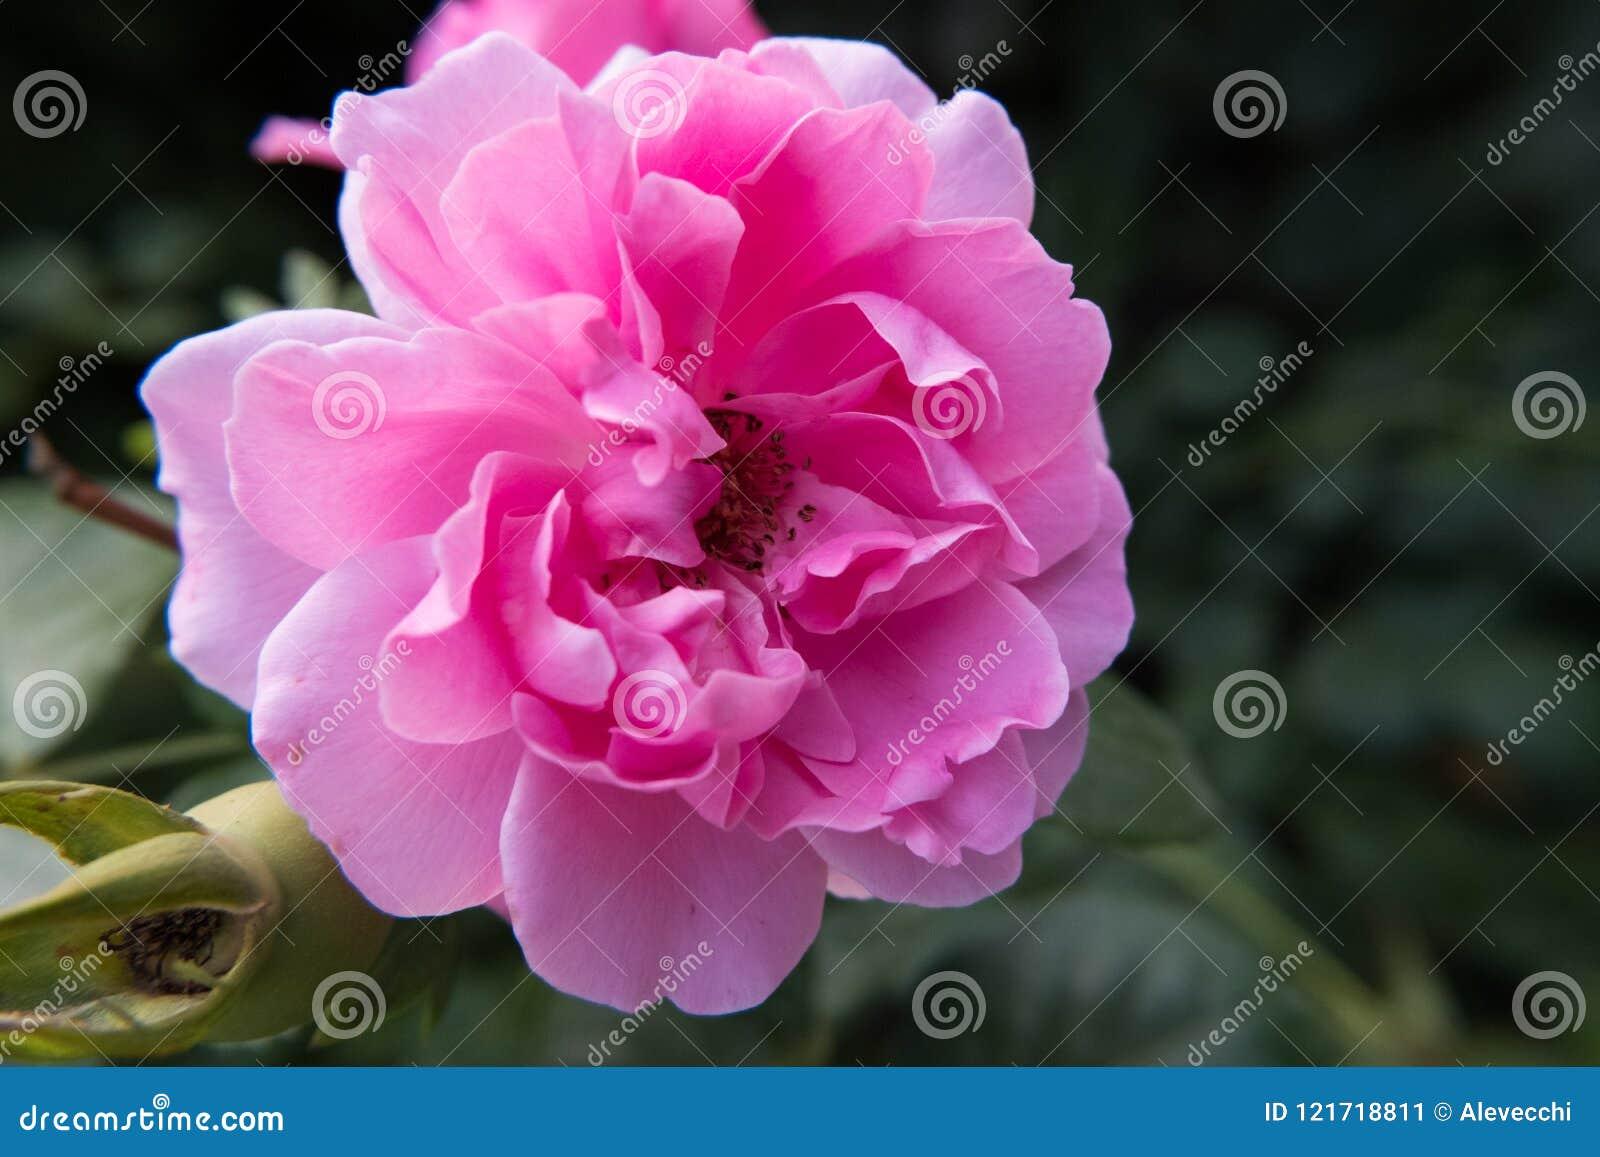 Pink rose flower wallpaper stock image image of close beautiful download pink rose flower wallpaper stock image image of close beautiful 121718811 mightylinksfo